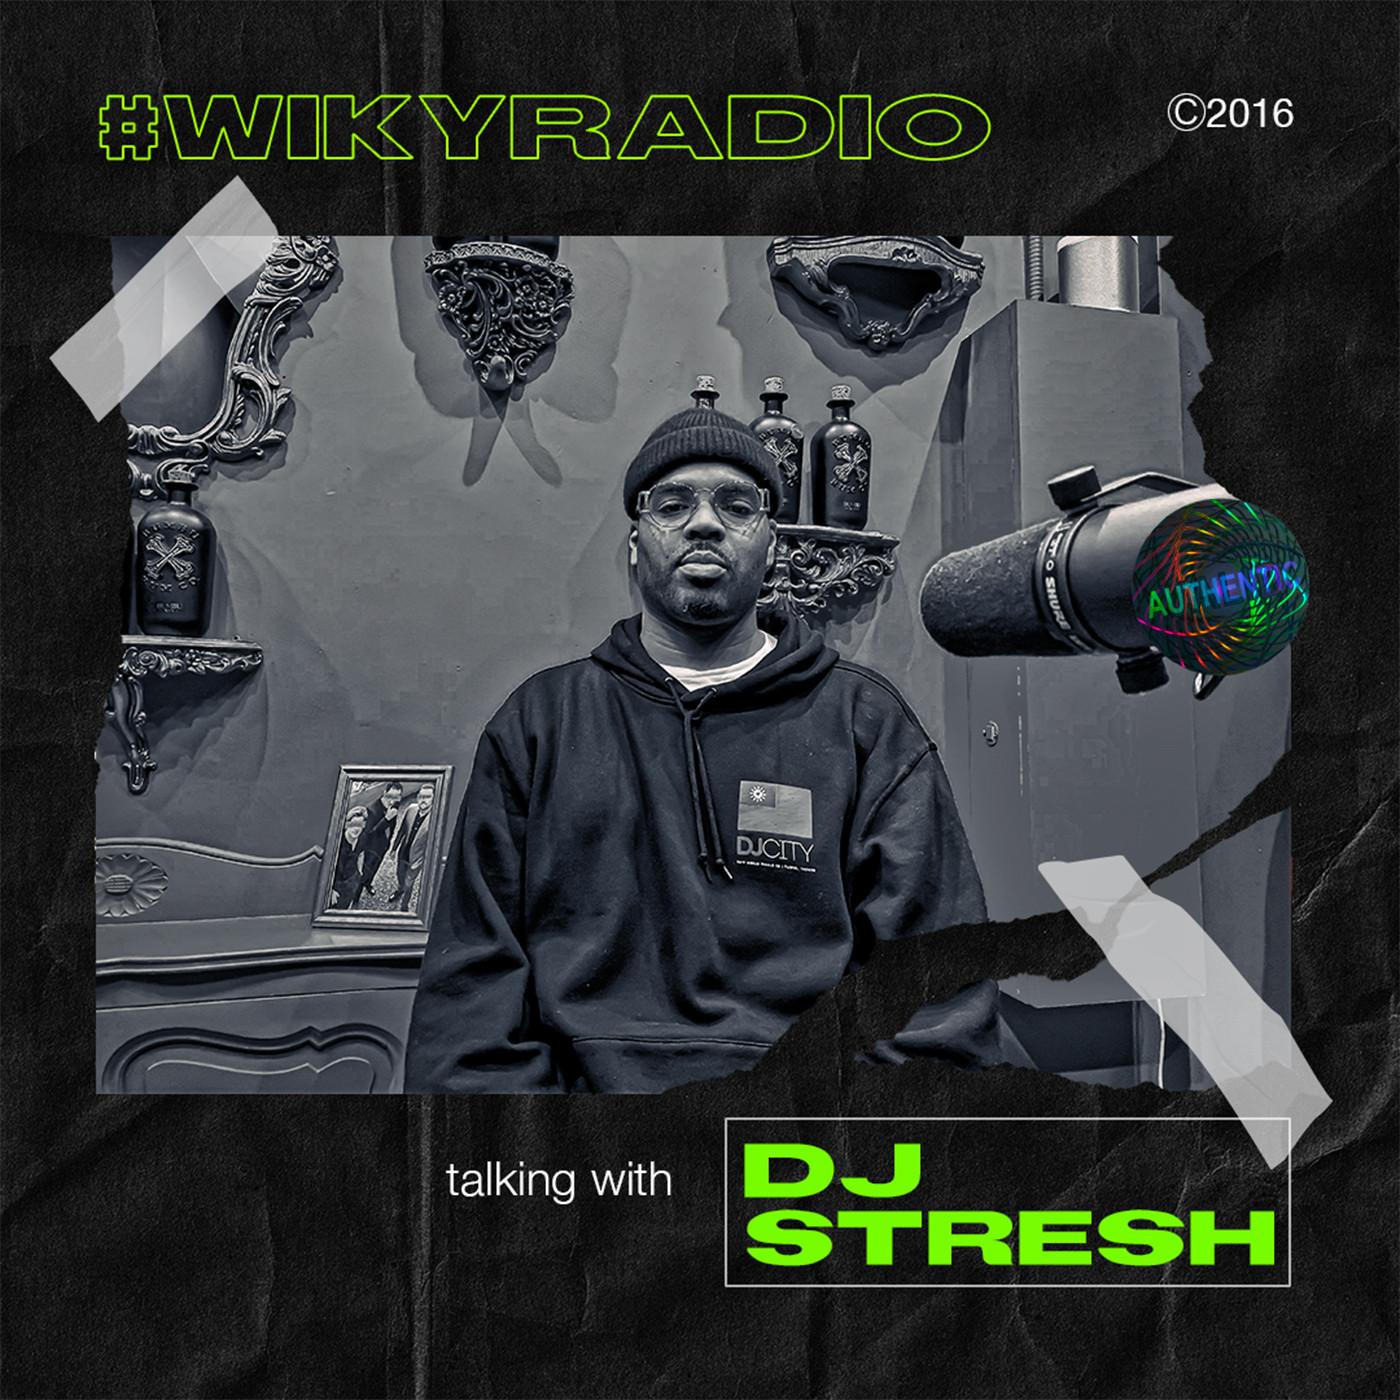 WIKY RADIO - TALKING WITH DJ STRESH